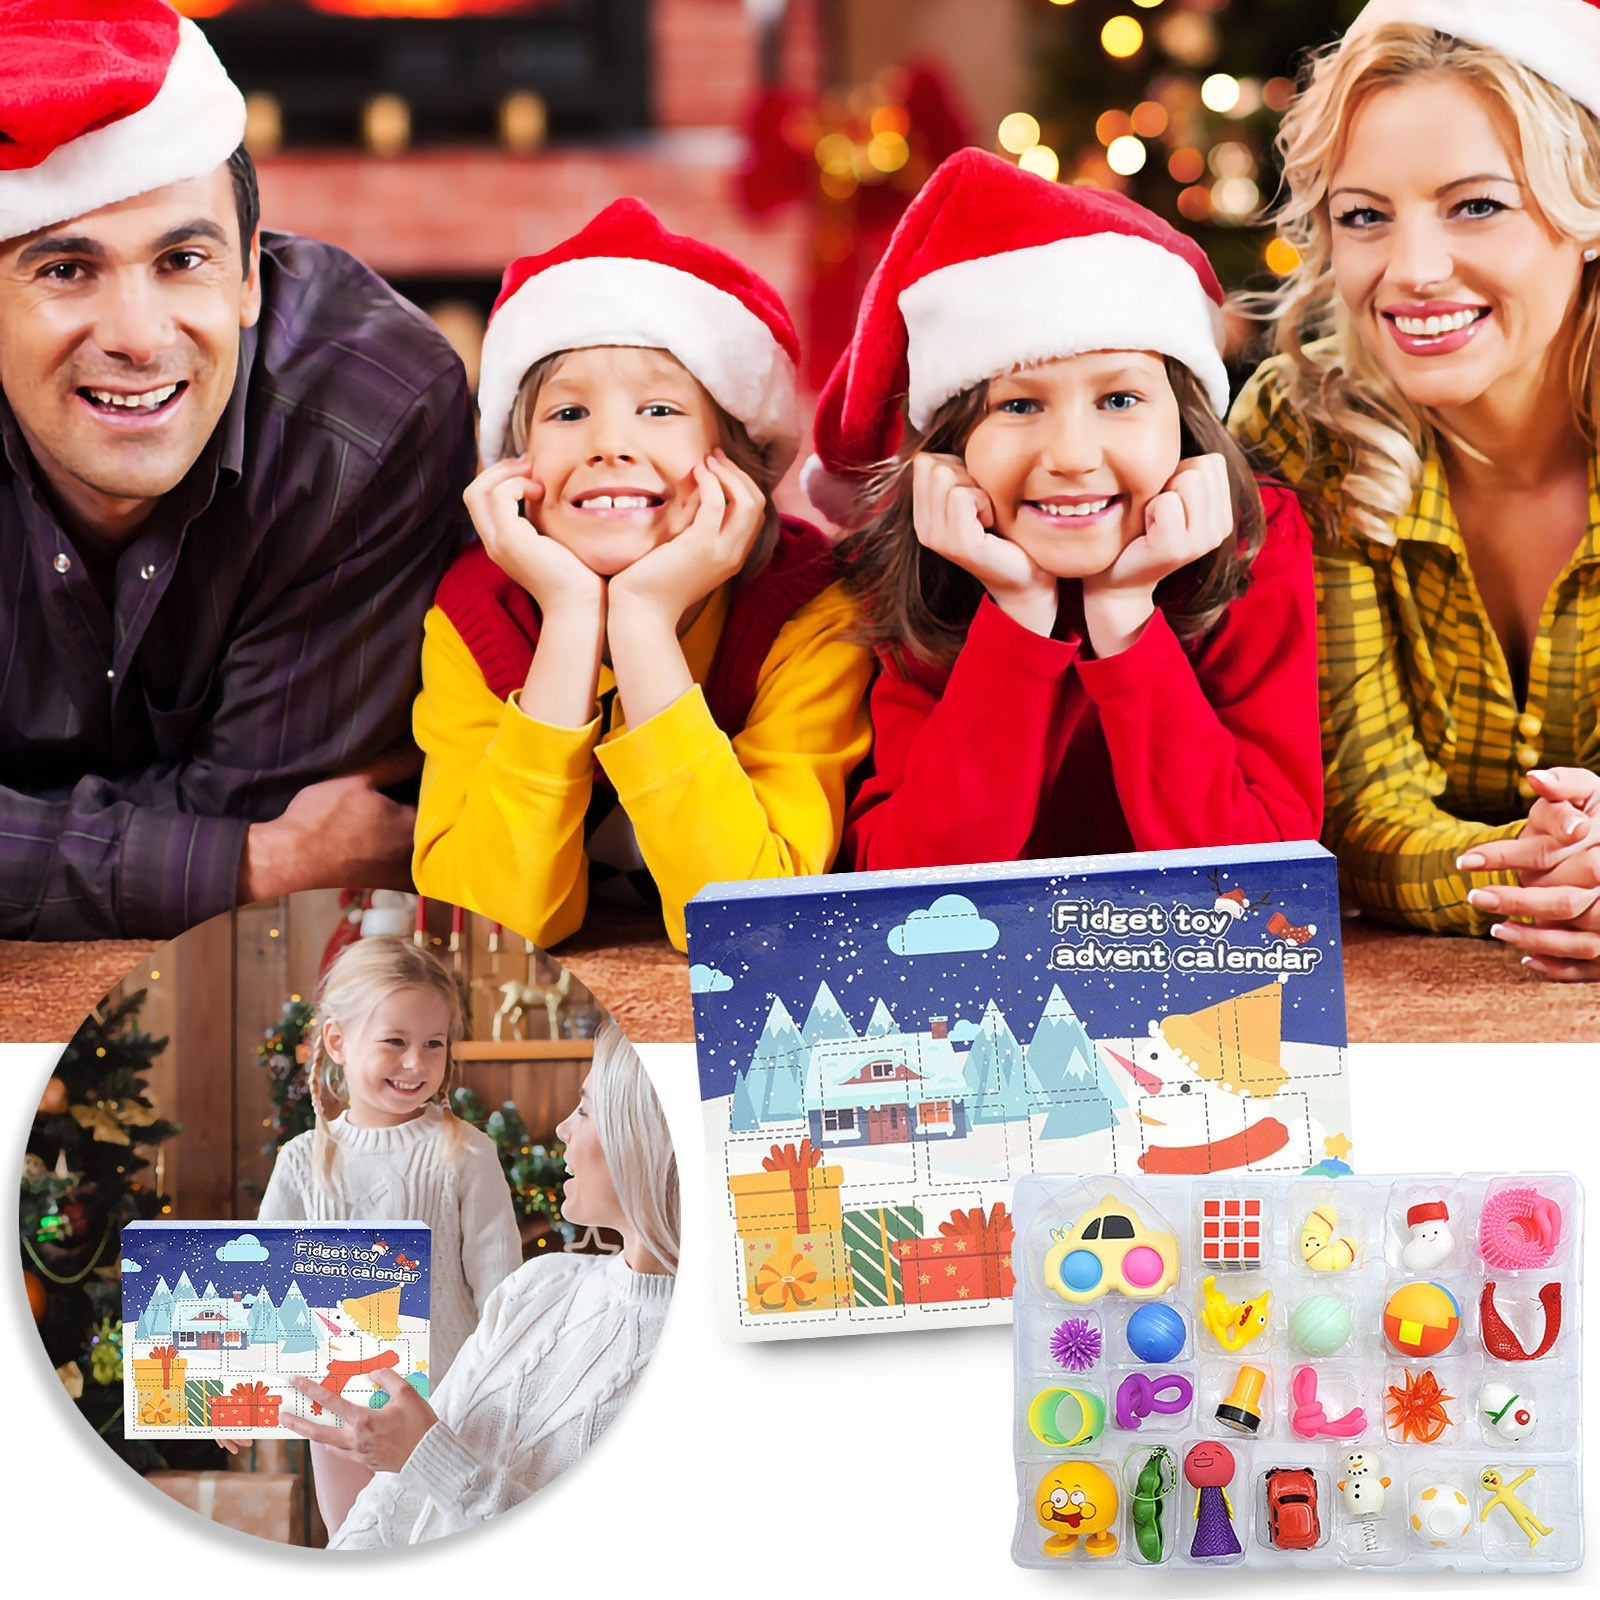 Pops Its Fidget Toys Pack New Popper Christmas Calendar Countdown Blind Box Surprise Demolition And